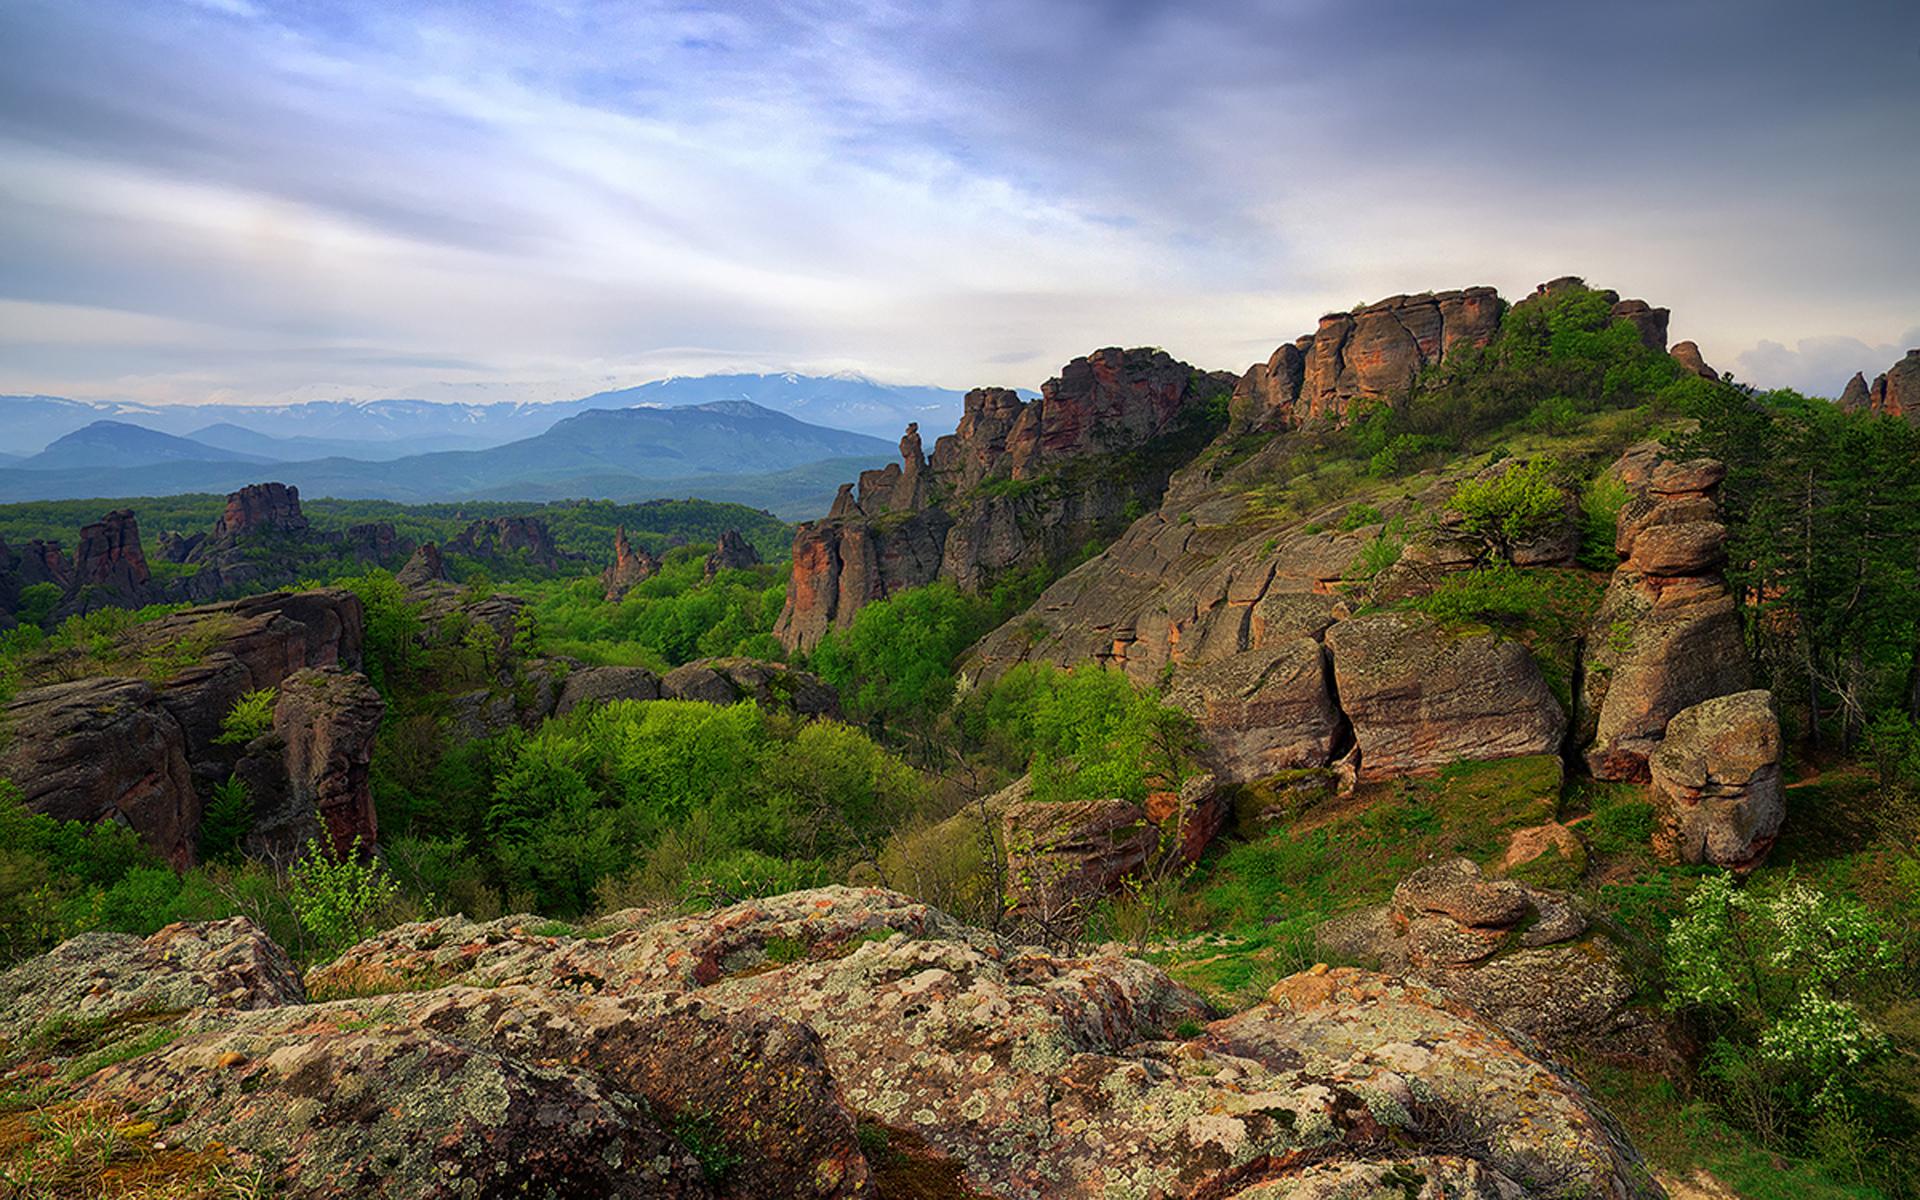 картинки для фона болгария можна наносити